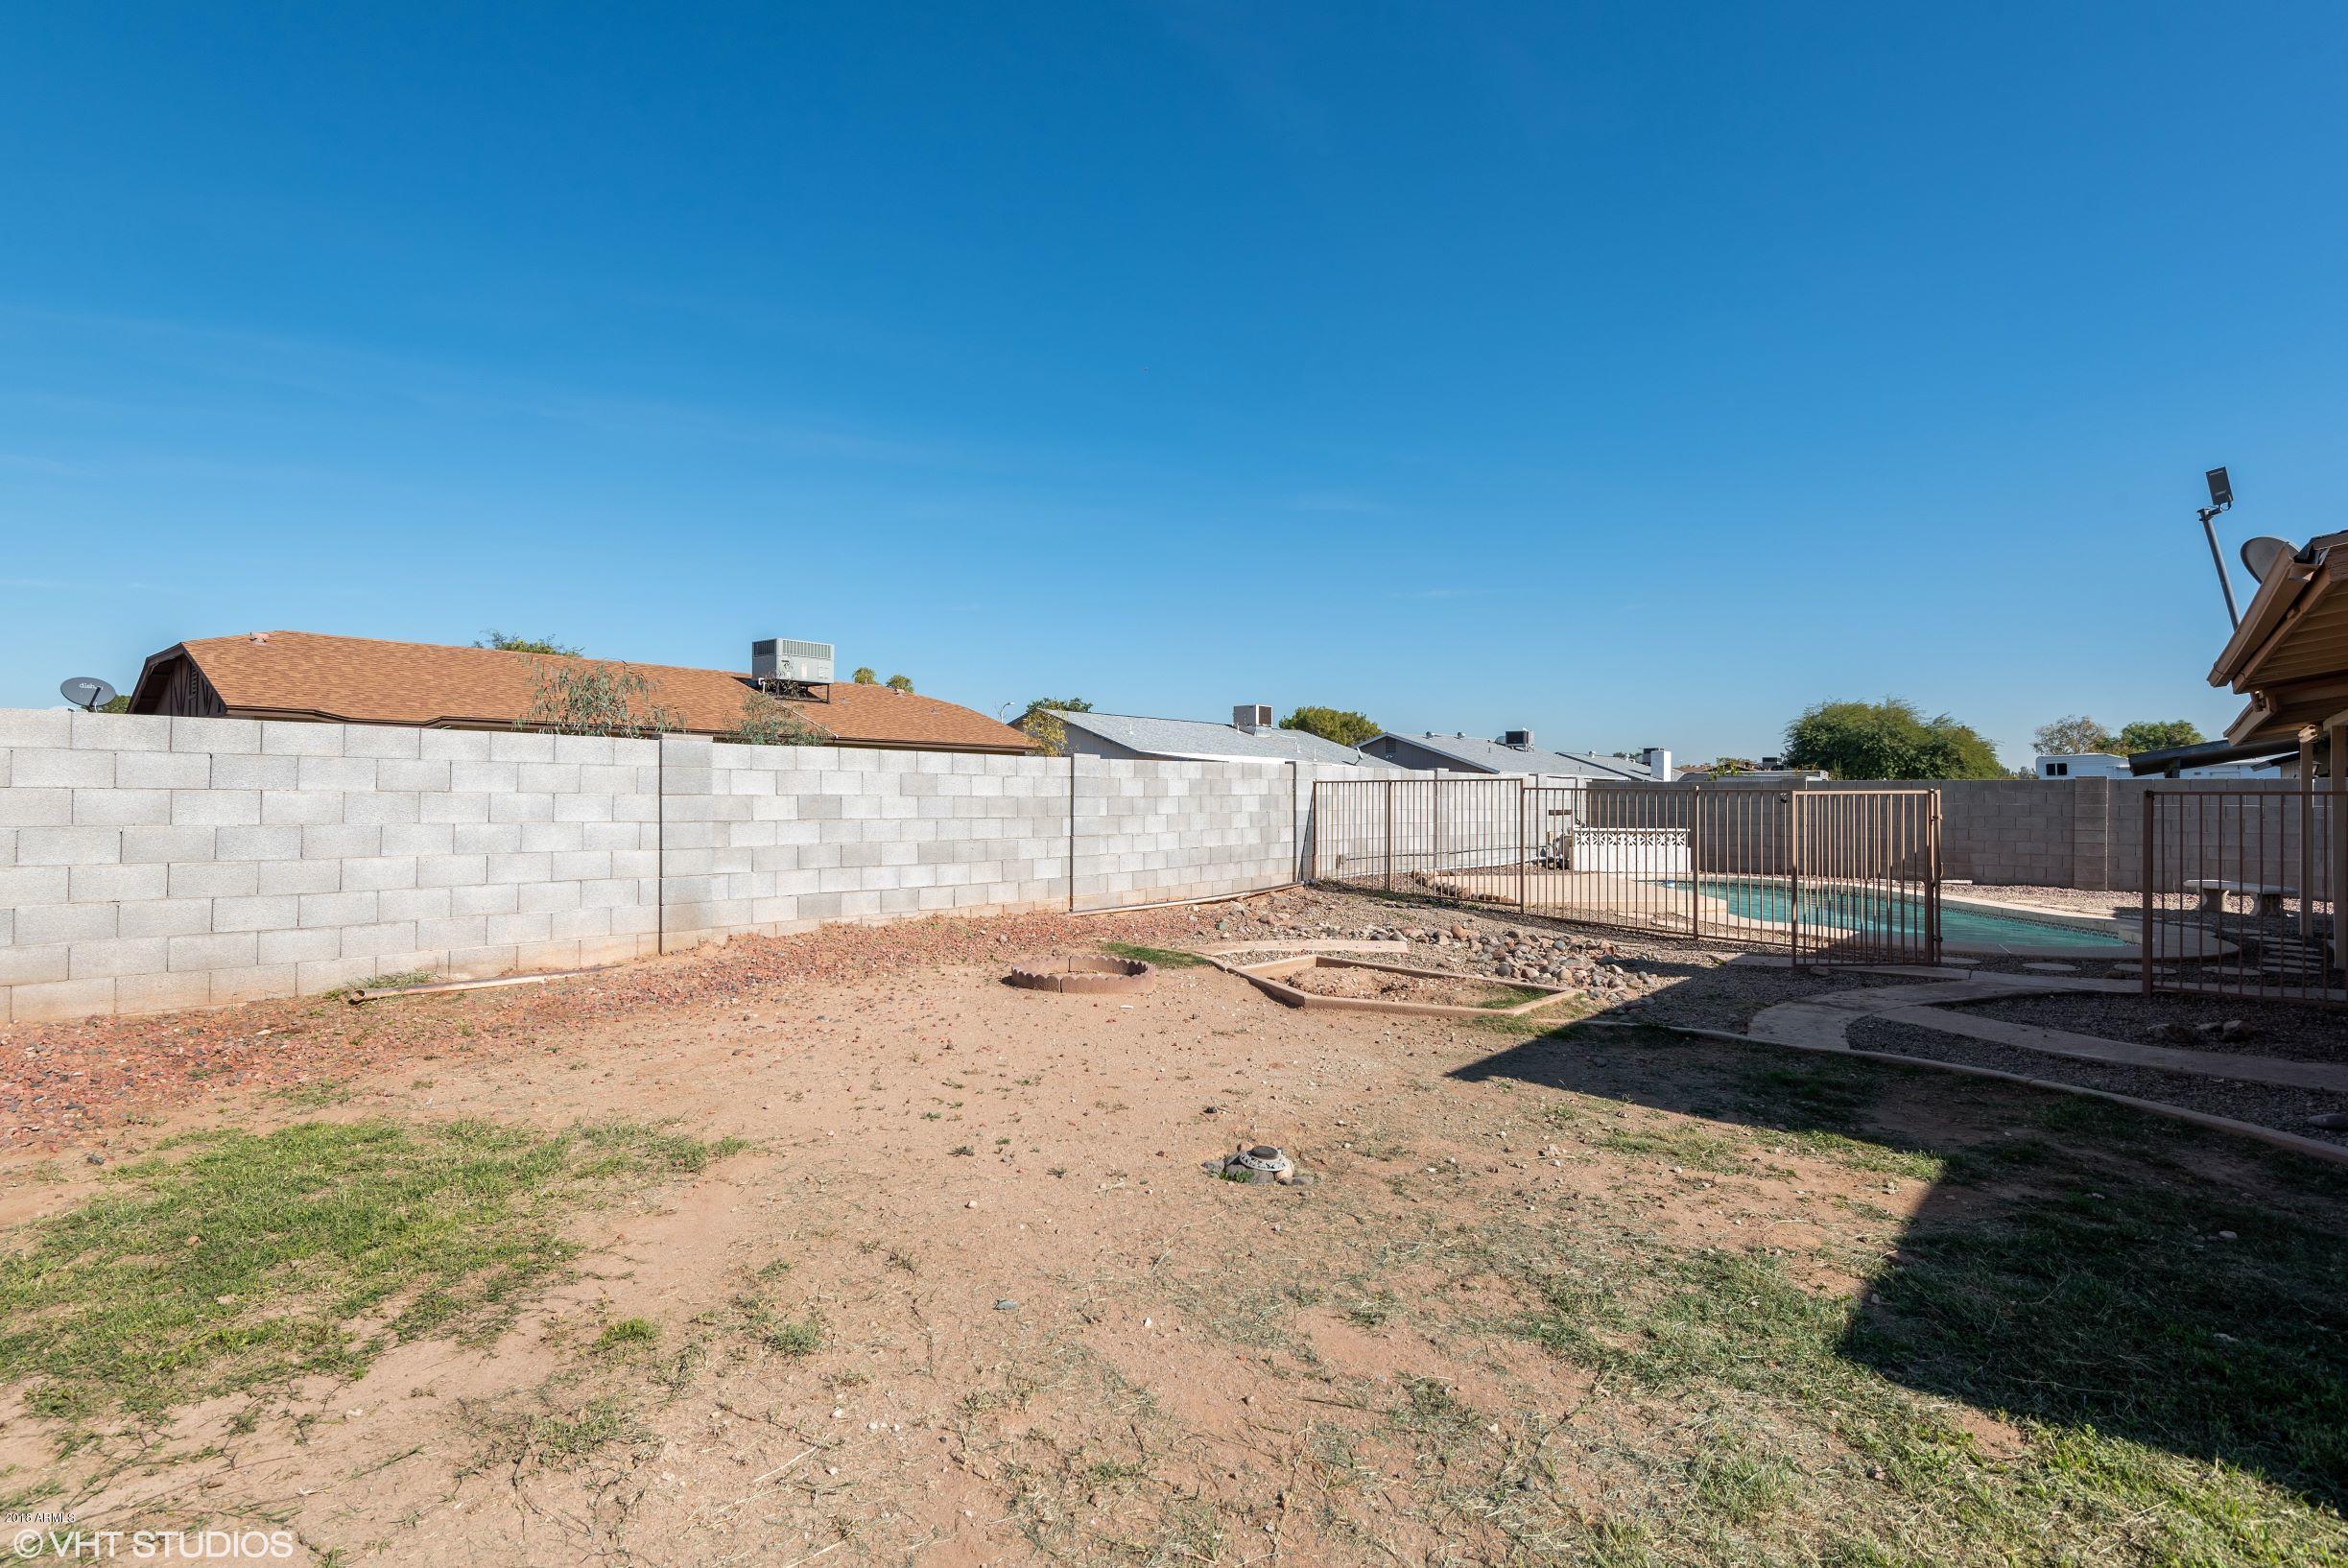 MLS 5851107 9614 W LAS PALMARITAS Drive, Peoria, AZ 85345 Peoria AZ REO Bank Owned Foreclosure